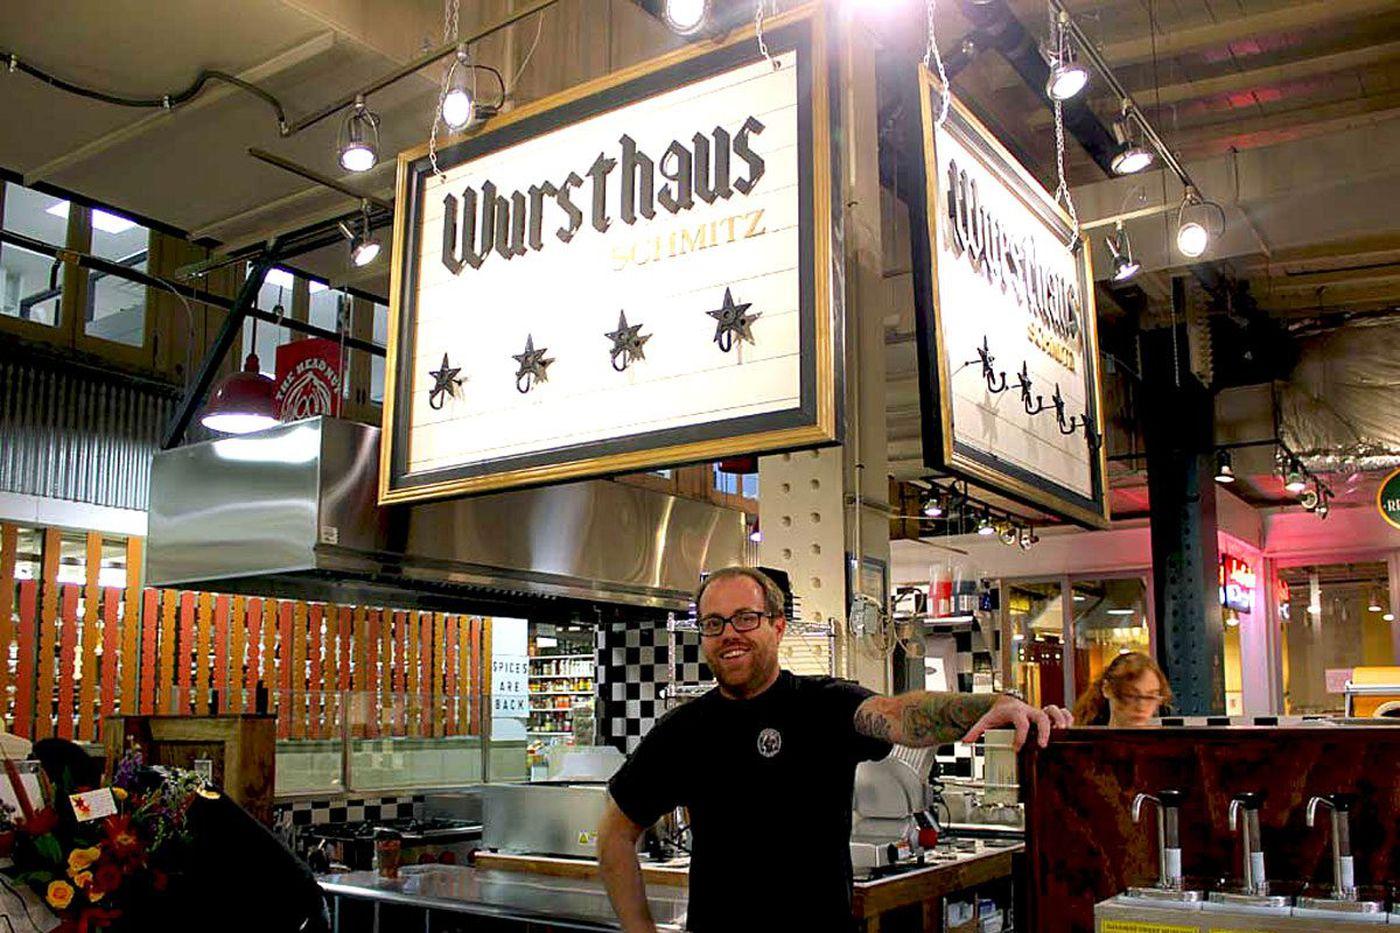 Wursthaus Schmitz at Reading Terminal Market to close